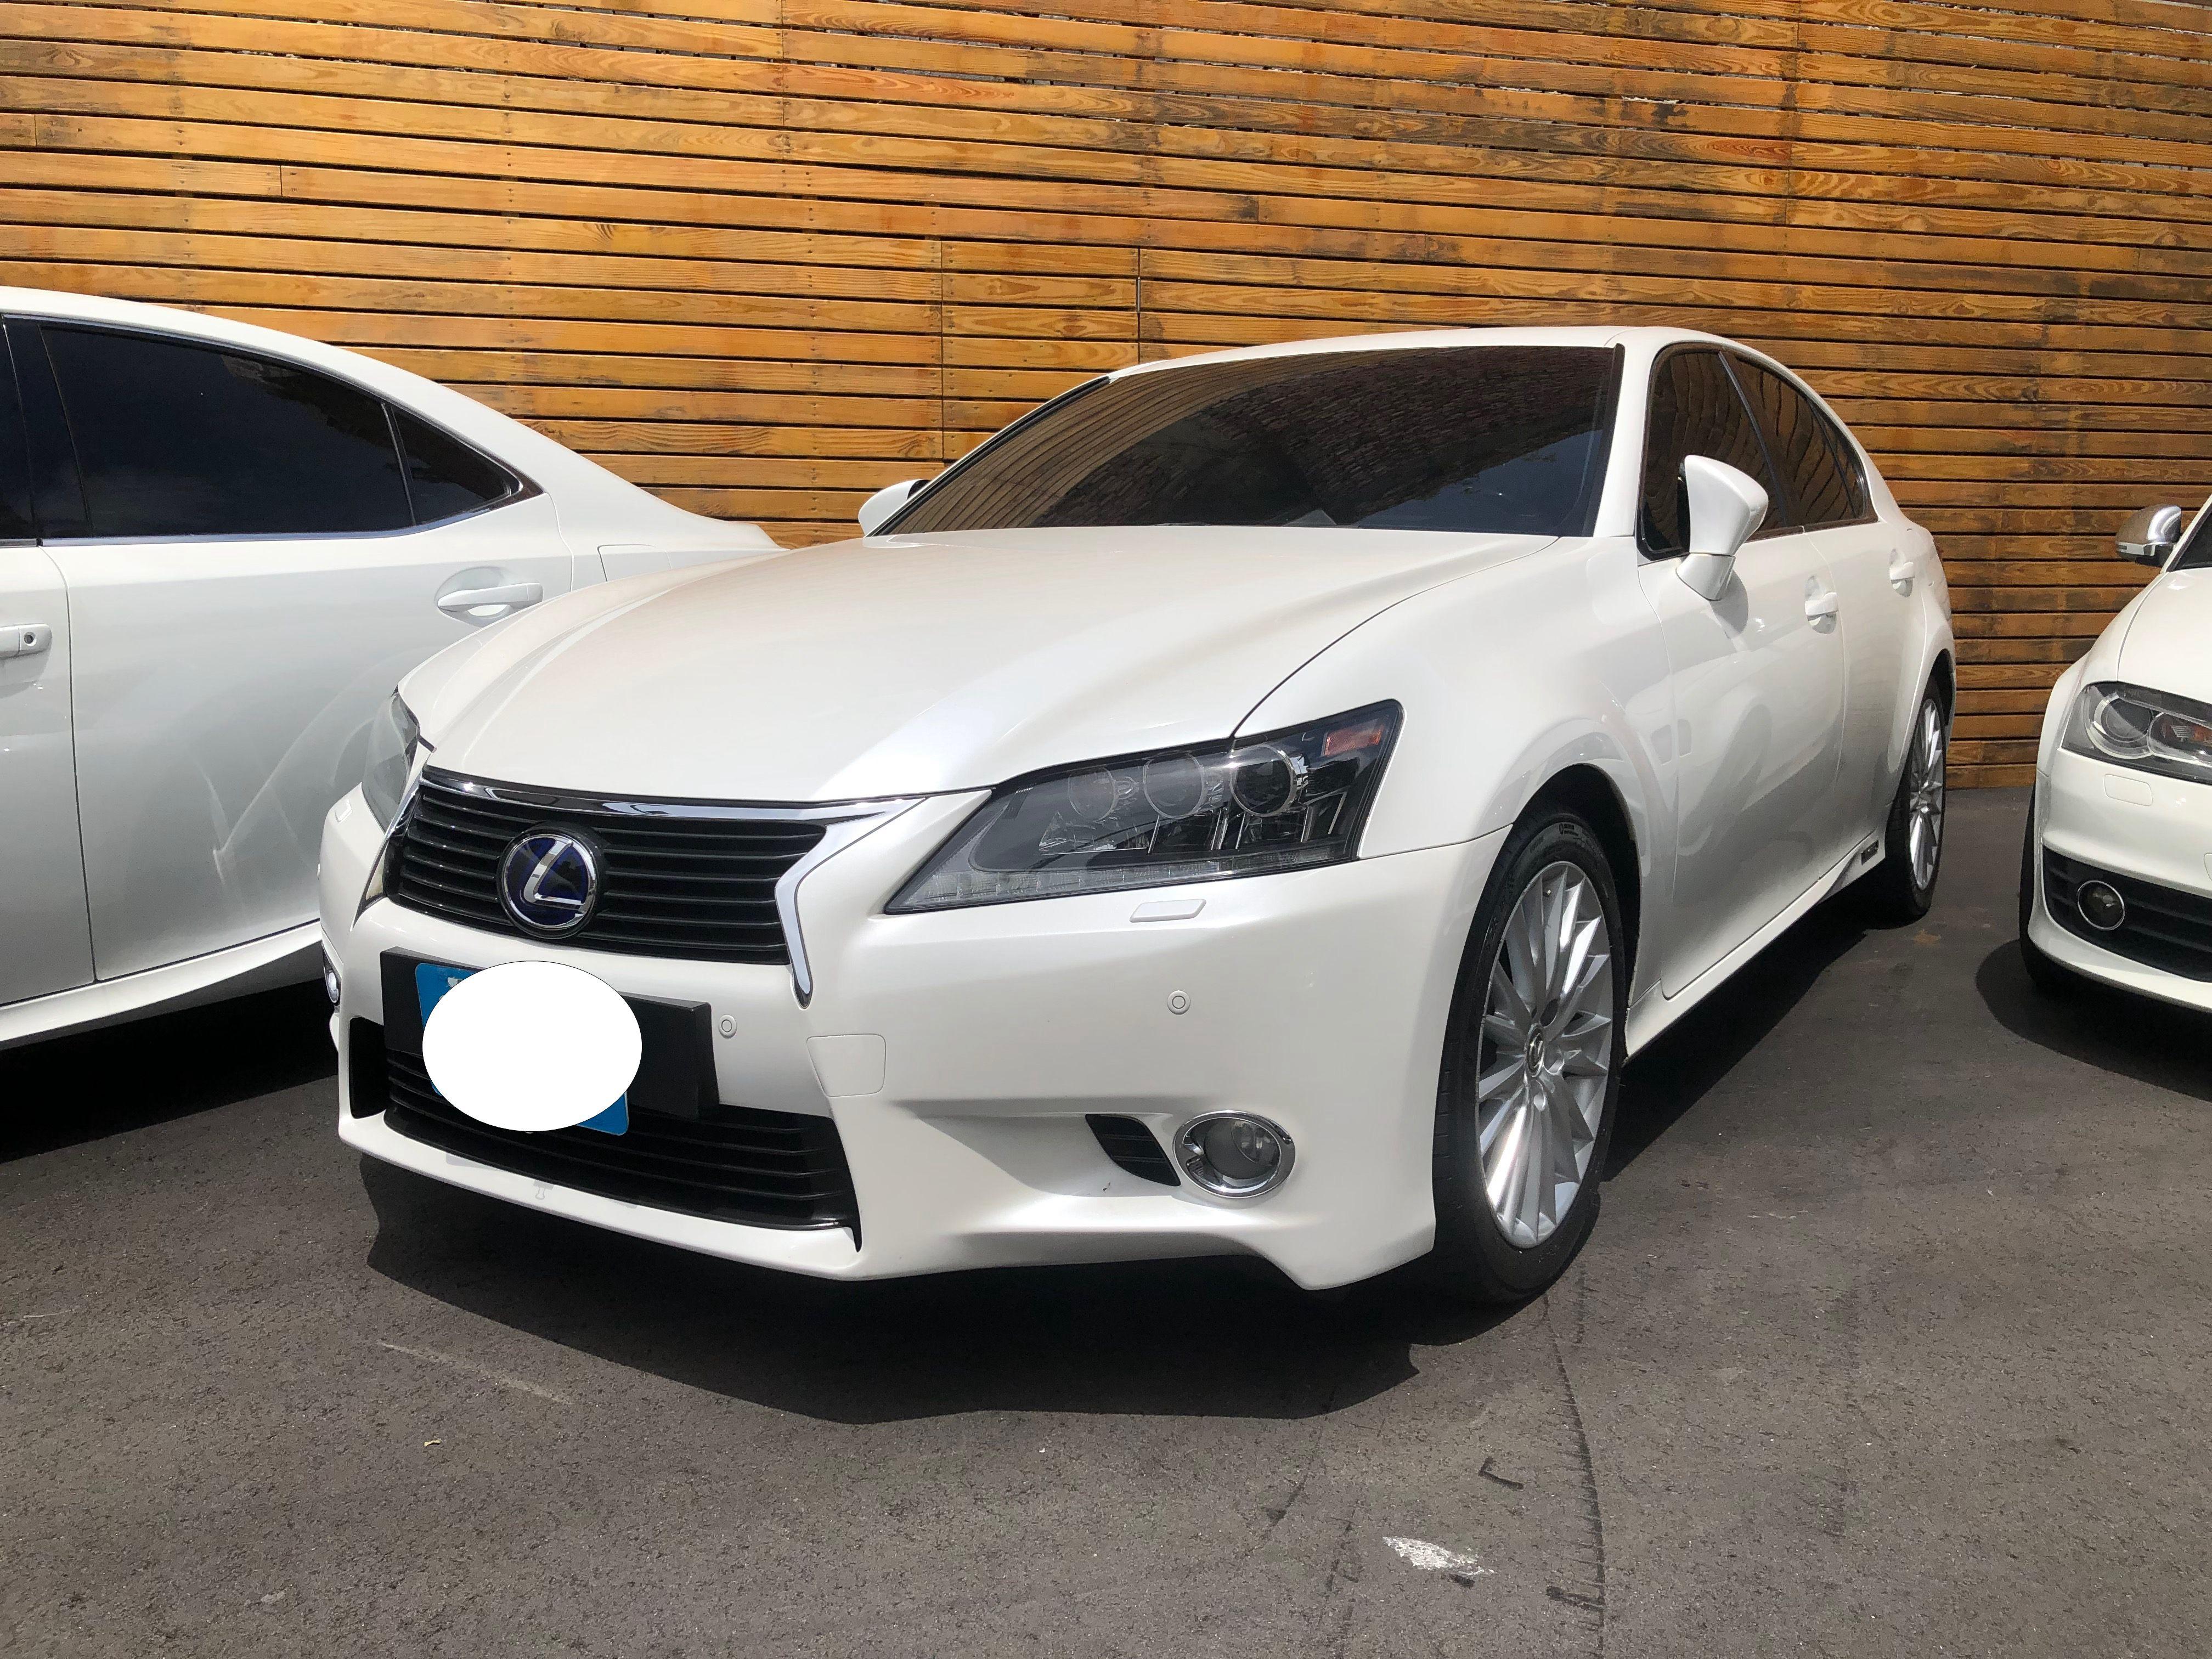 2012 Lexus 凌志 Gs